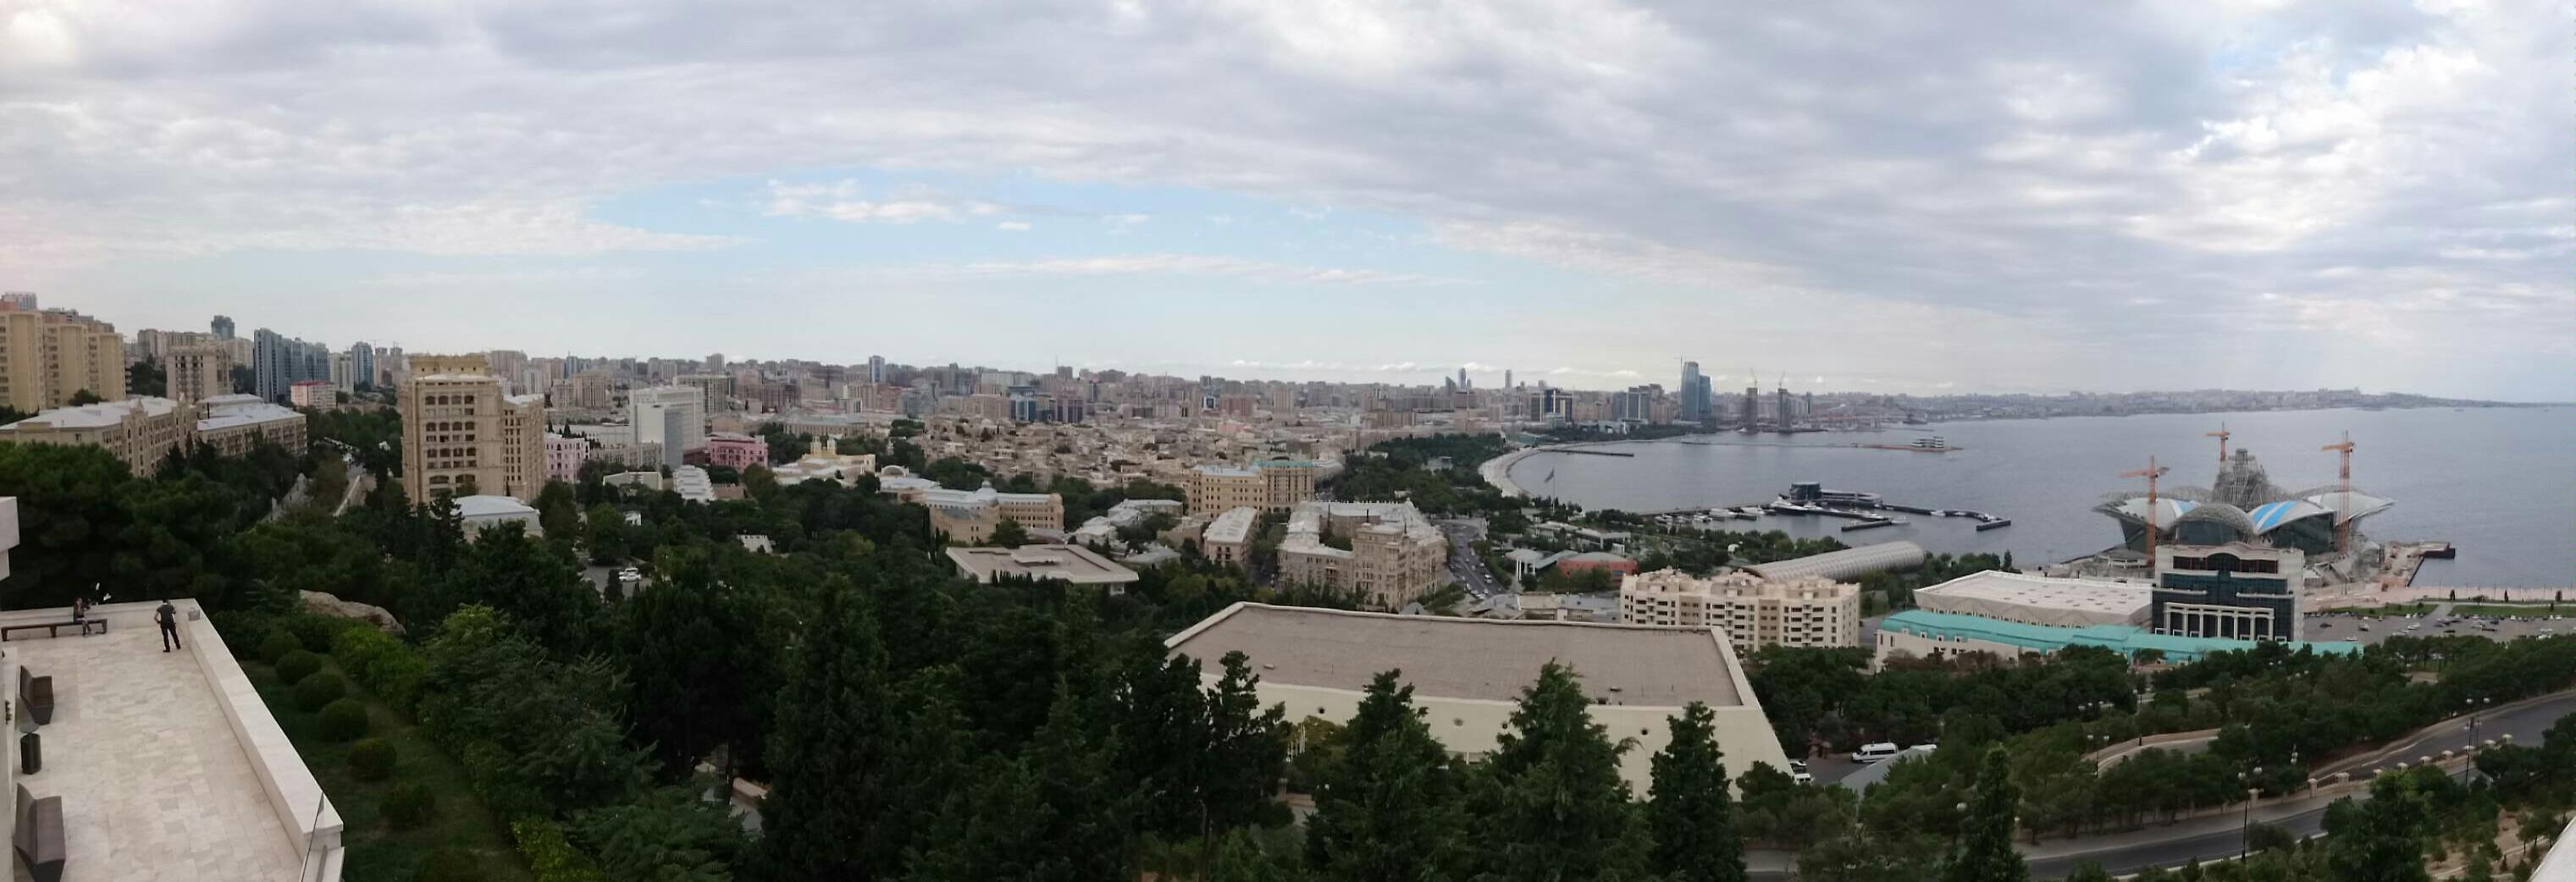 90 degree view of  Baku by BayOlympus